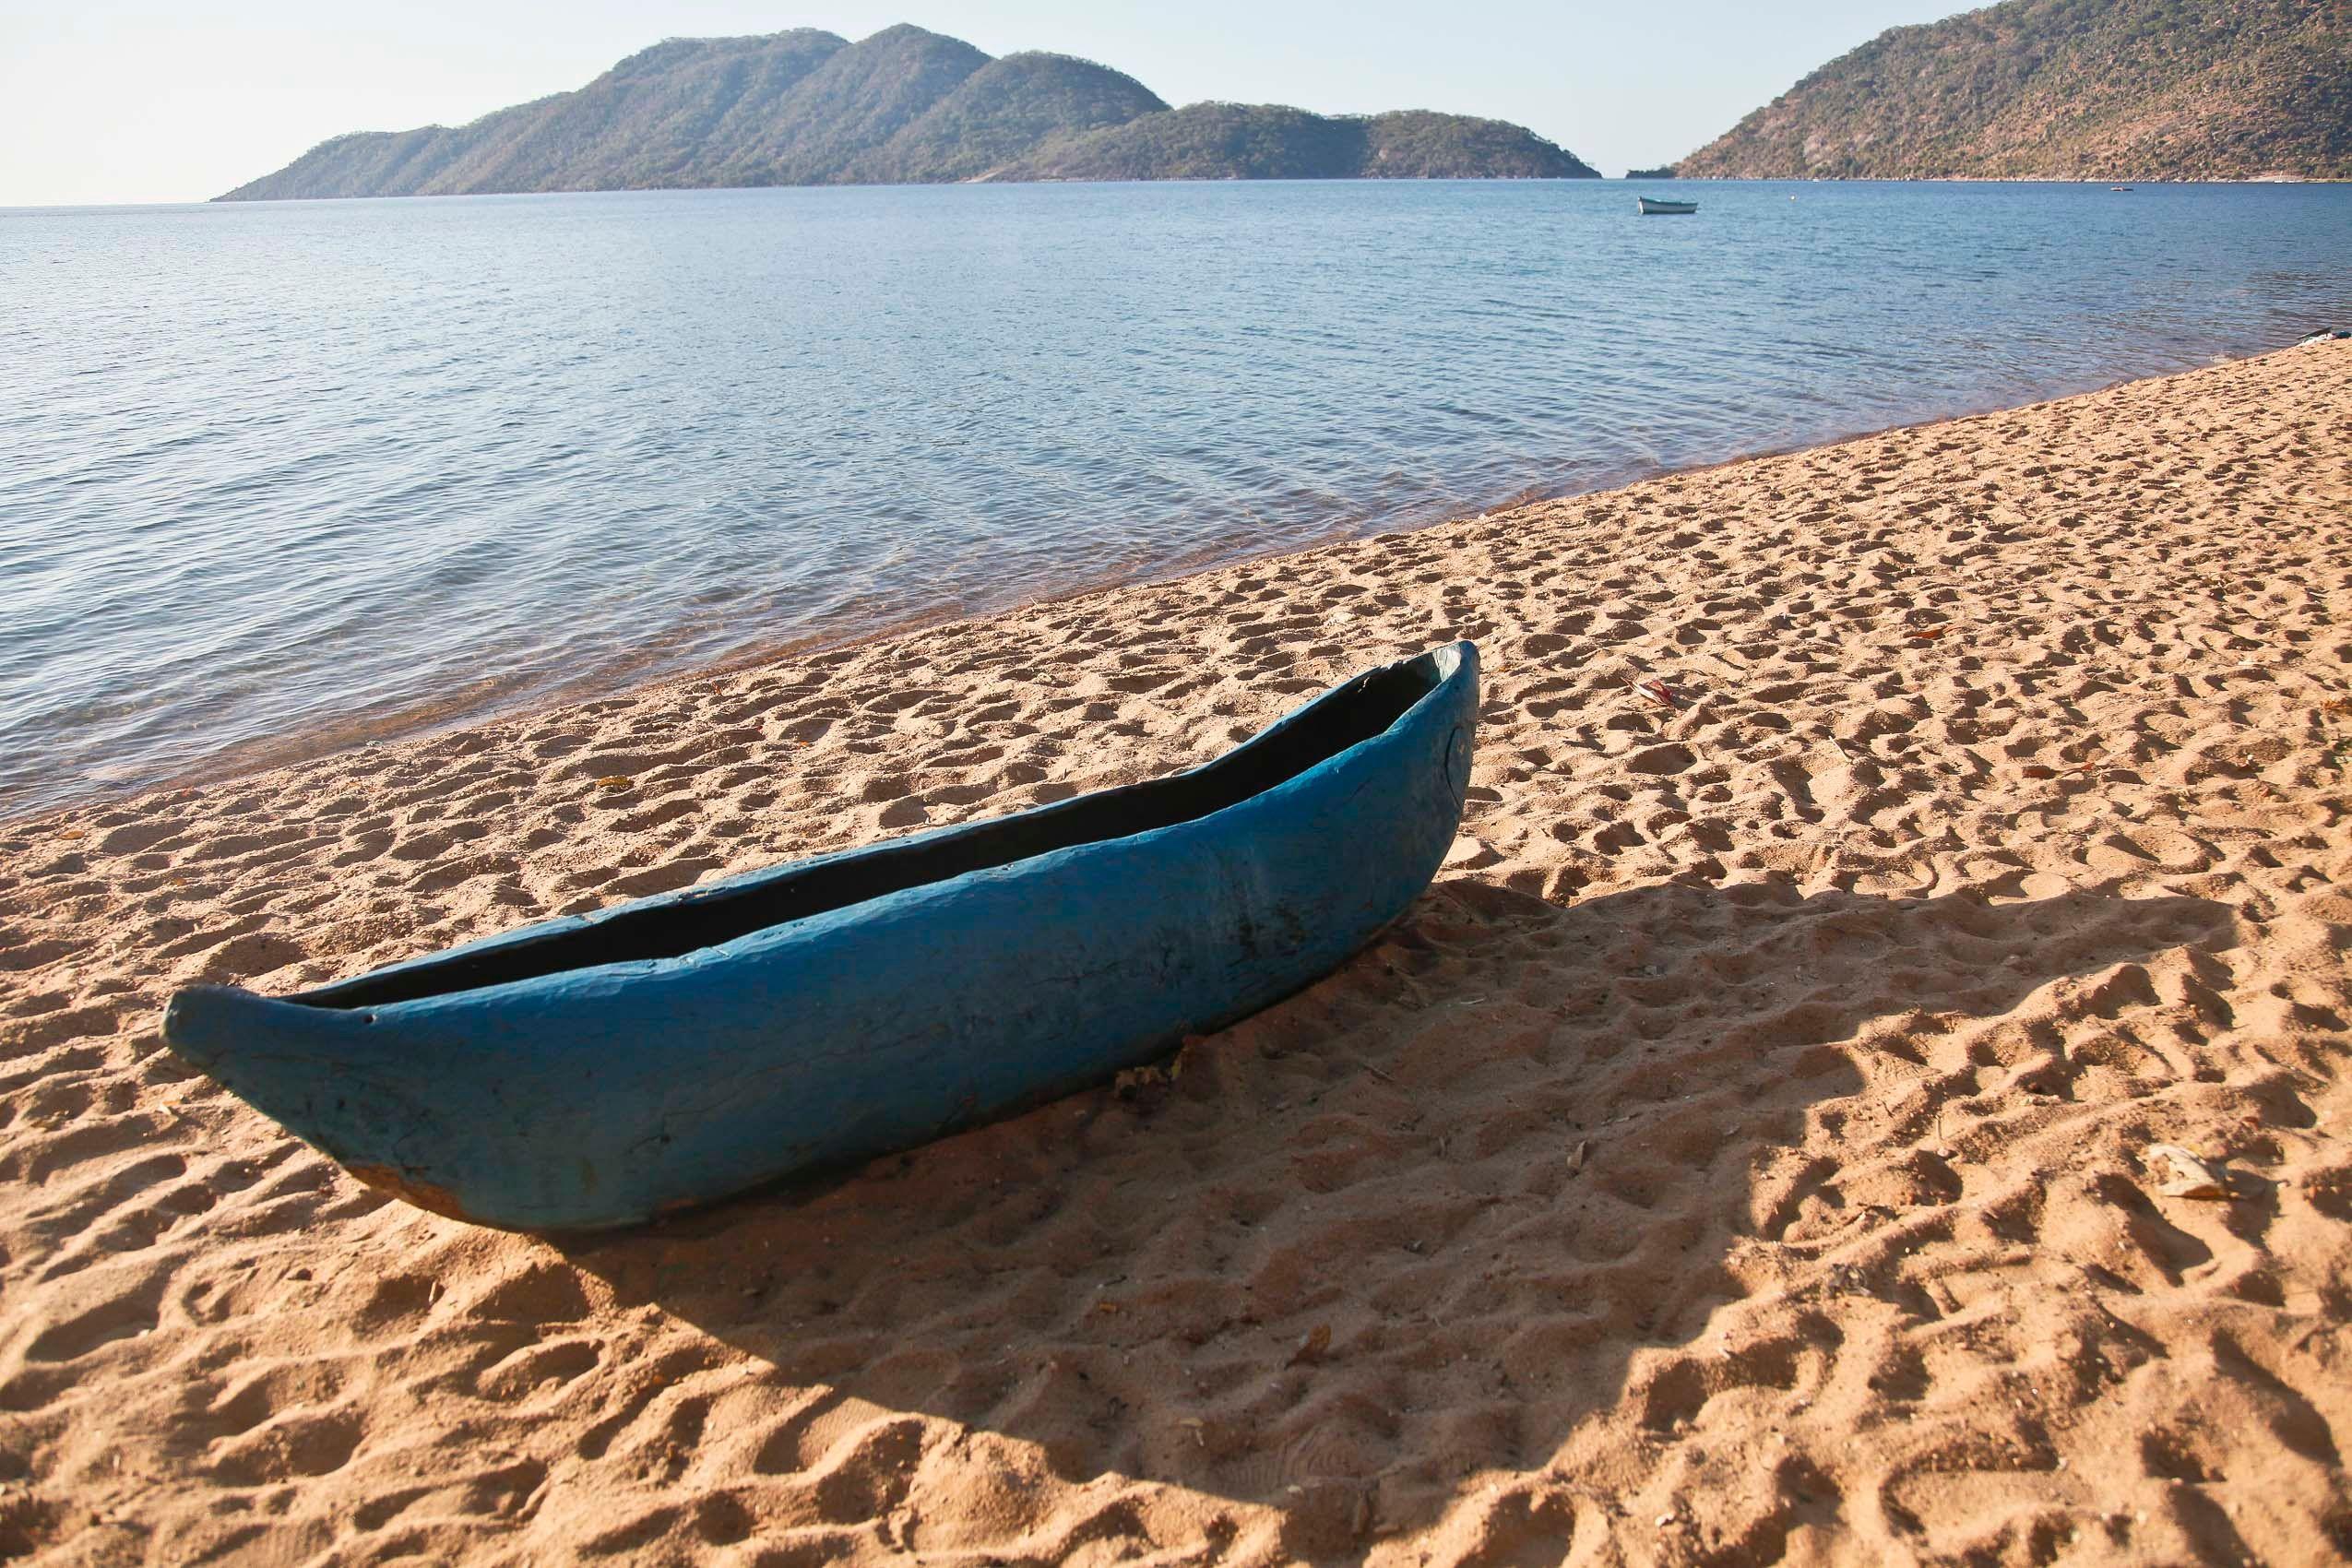 malawi_lake_malawi_canoe.jpg